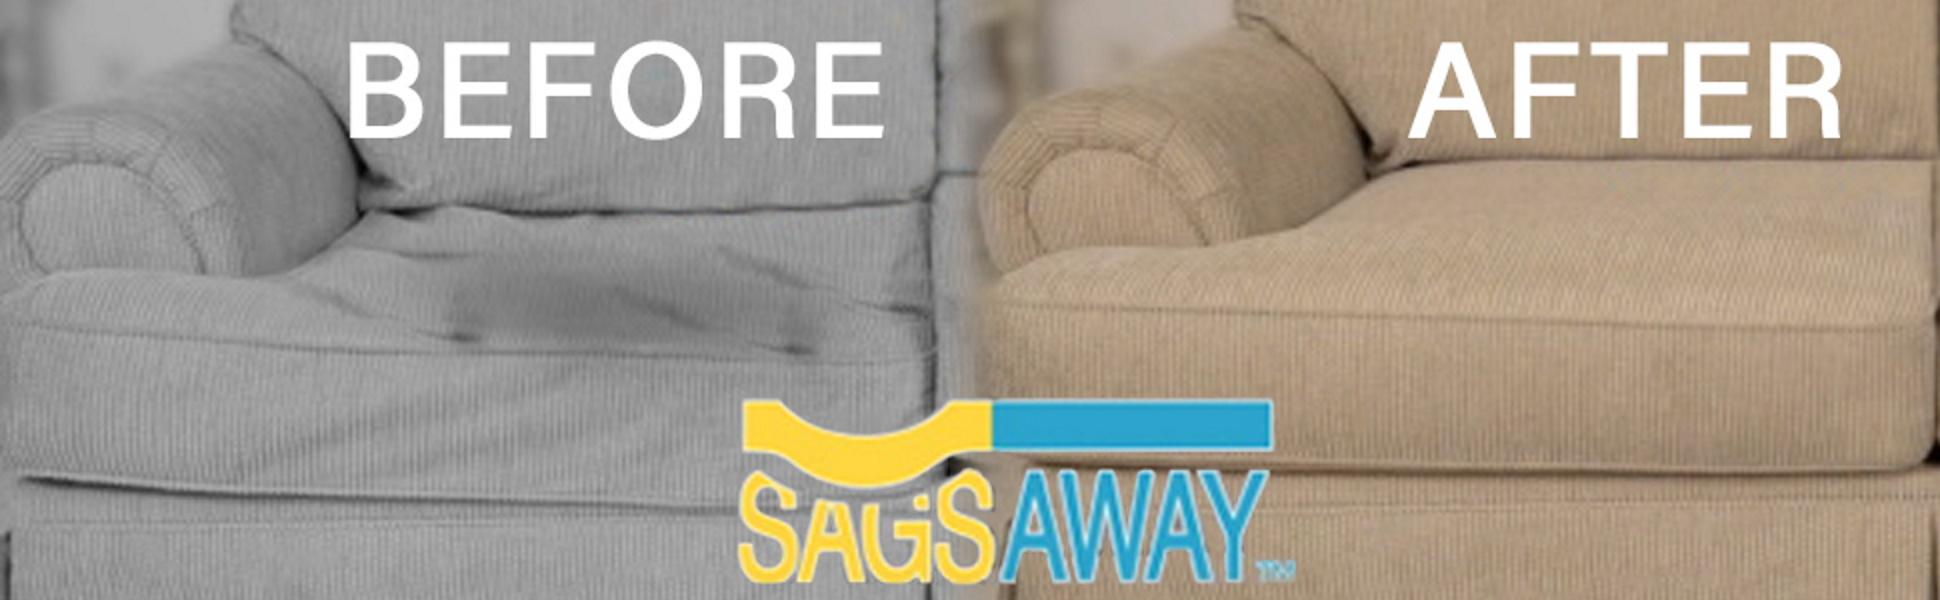 Sagging Cushion Support, Sofa Cushion Support Panels